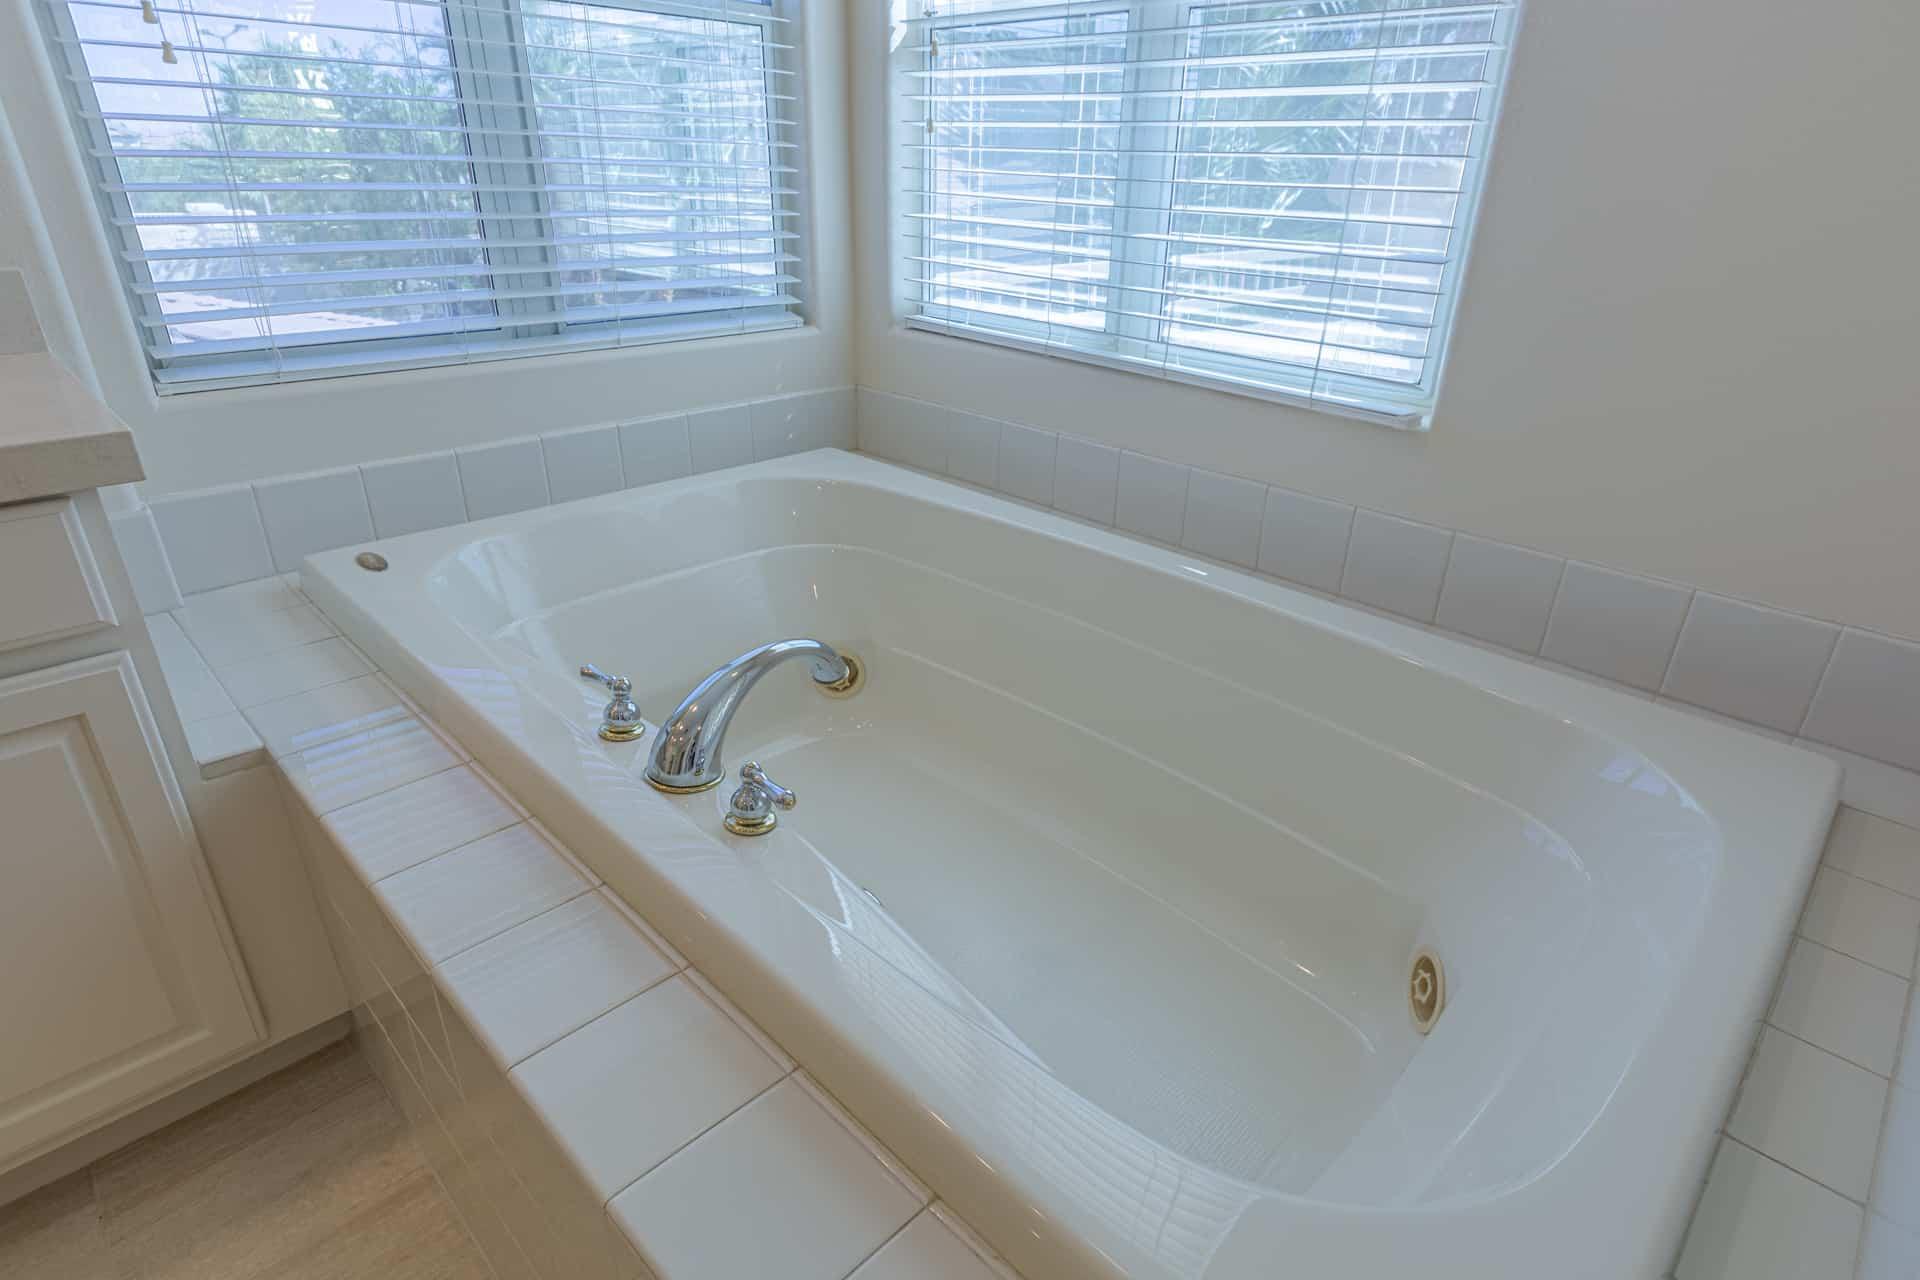 las-vegas-luxry-real-estate-realtor-rob-jensen-company-10729-grey-havens-court-willow-creek3557